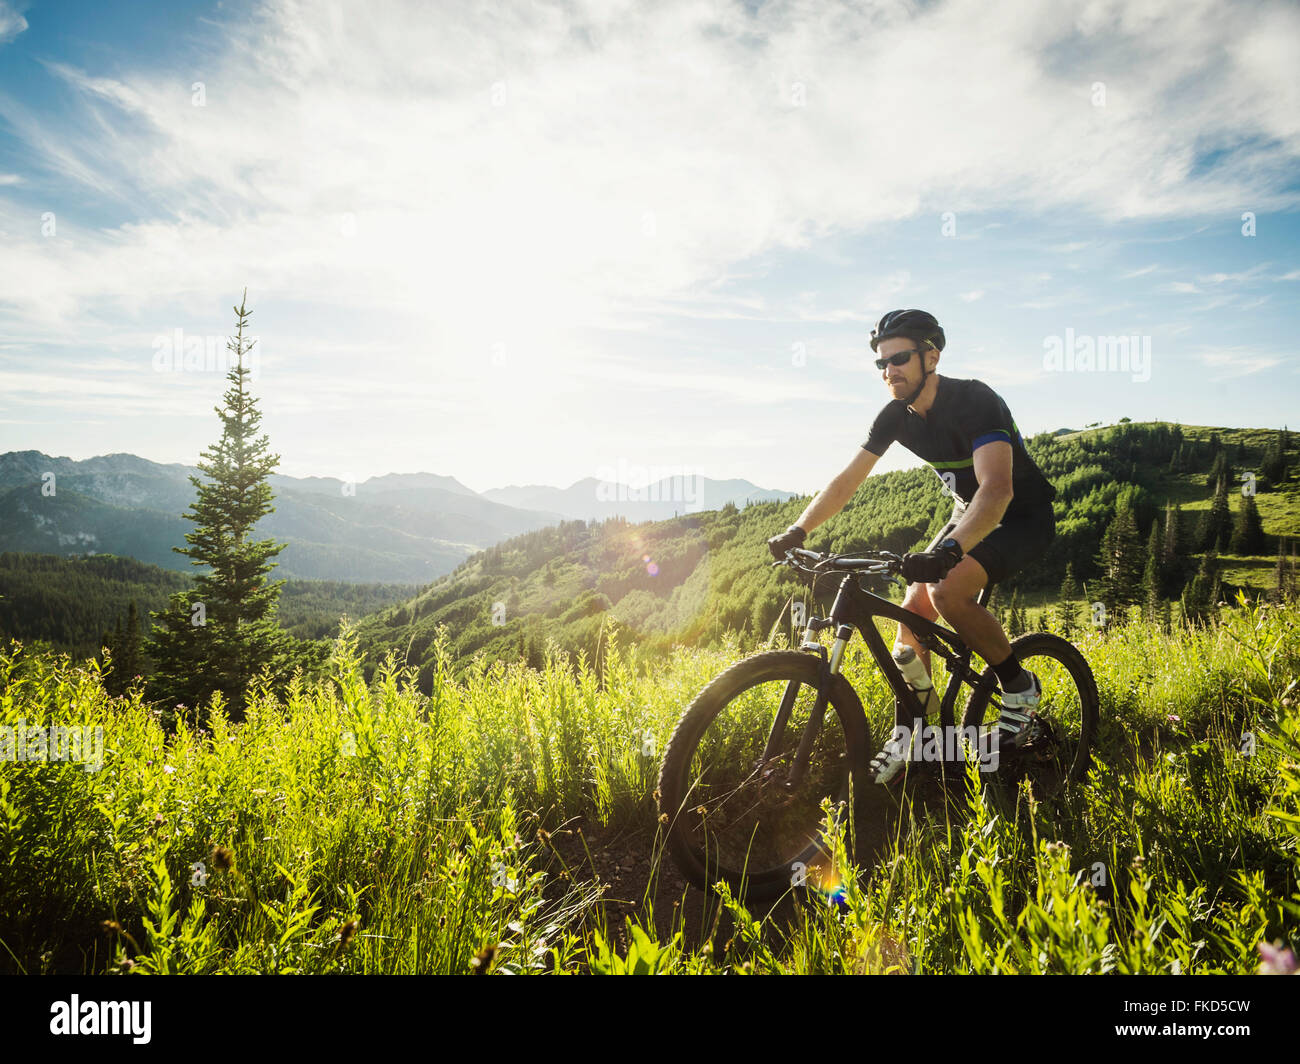 Mann während der Fahrradtour in Berglandschaft Stockbild